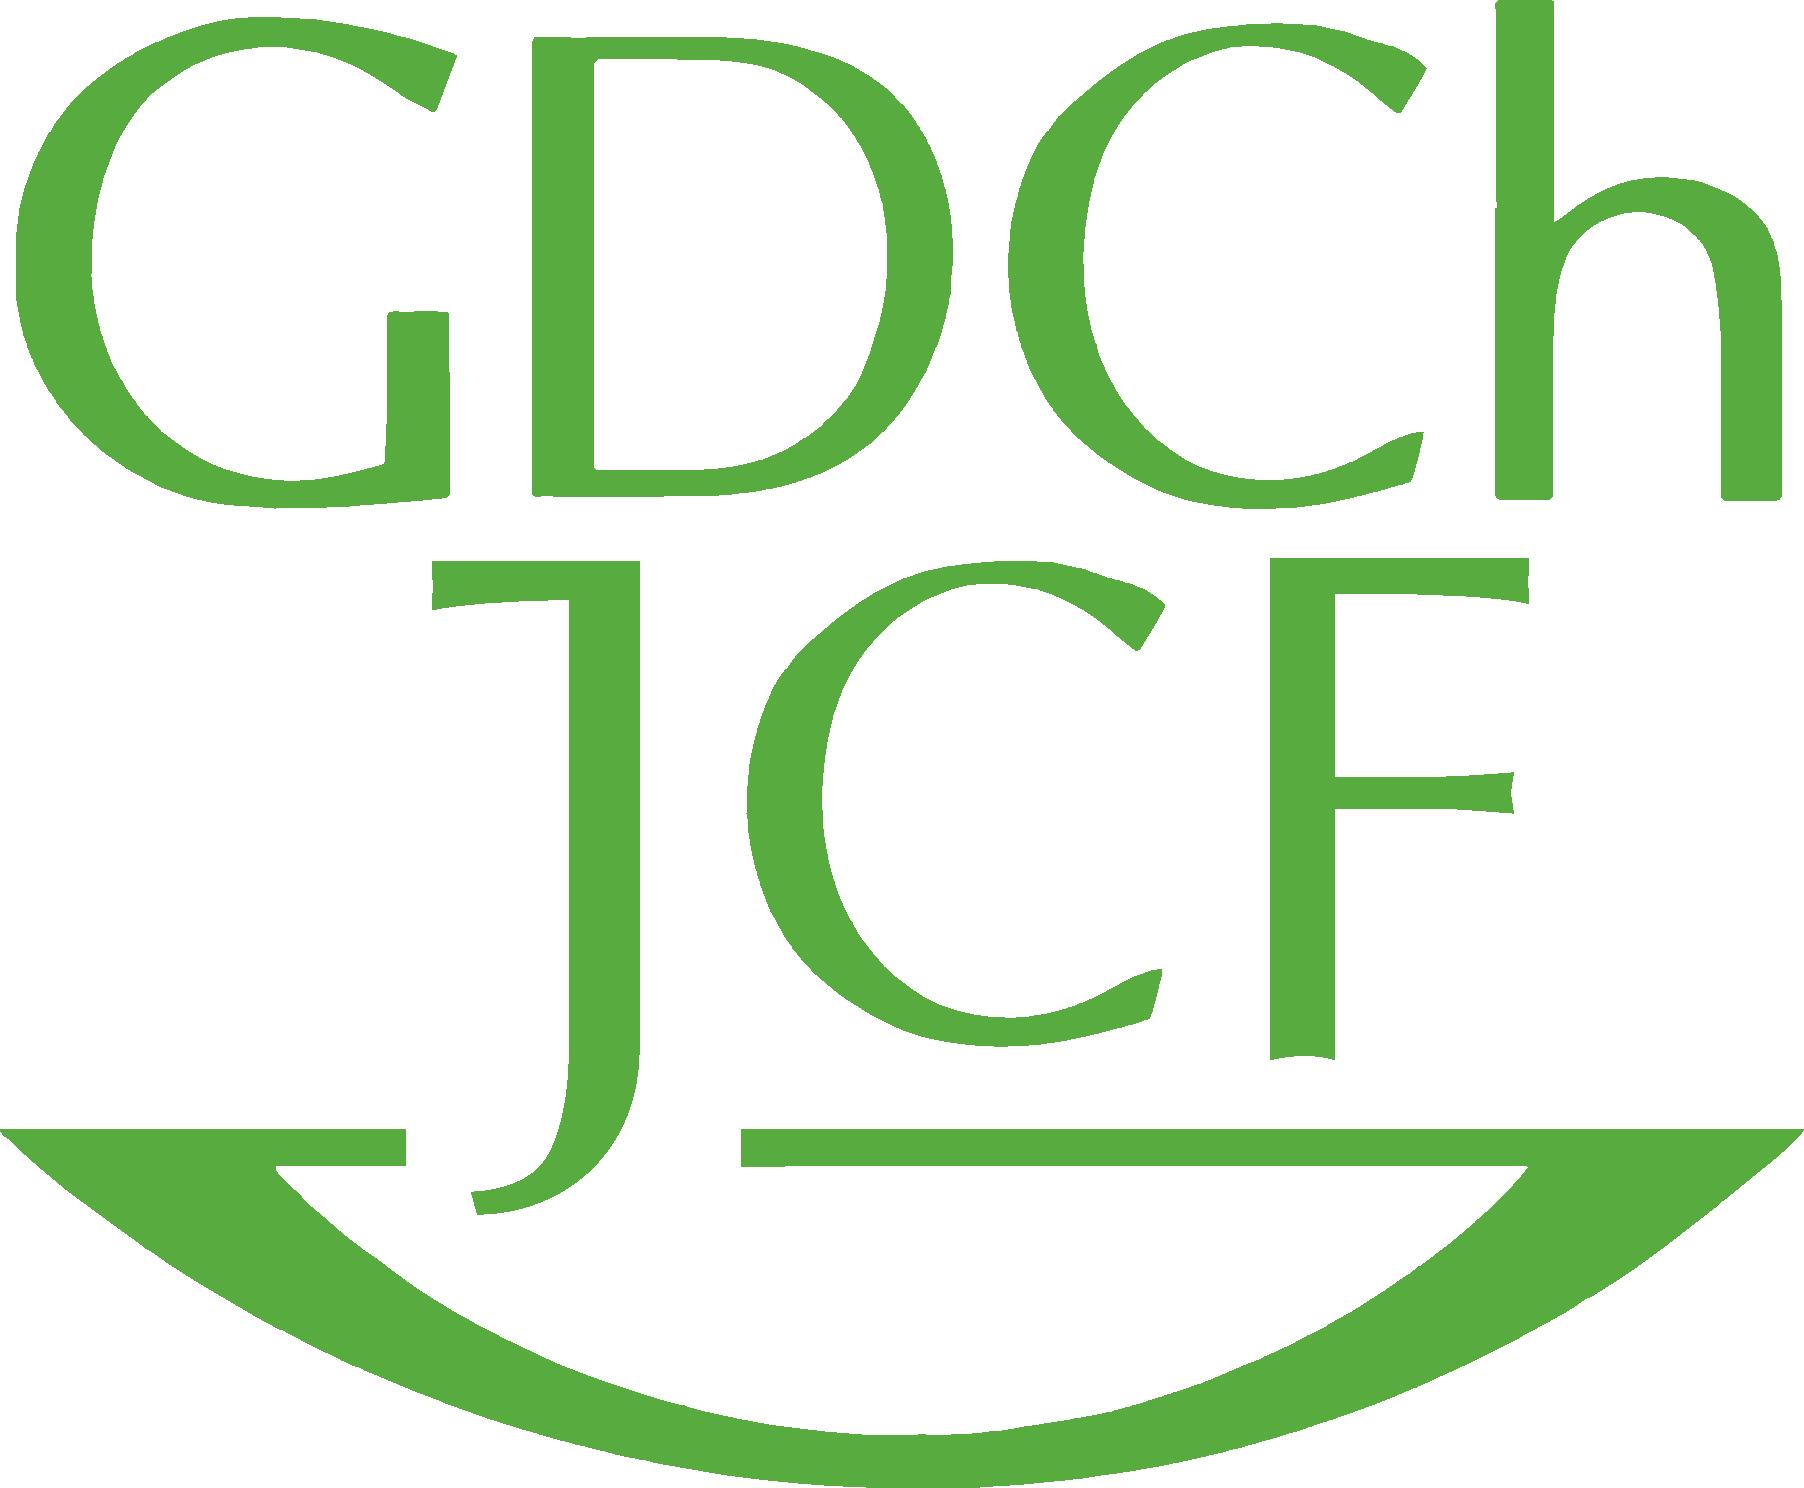 jcf_trans